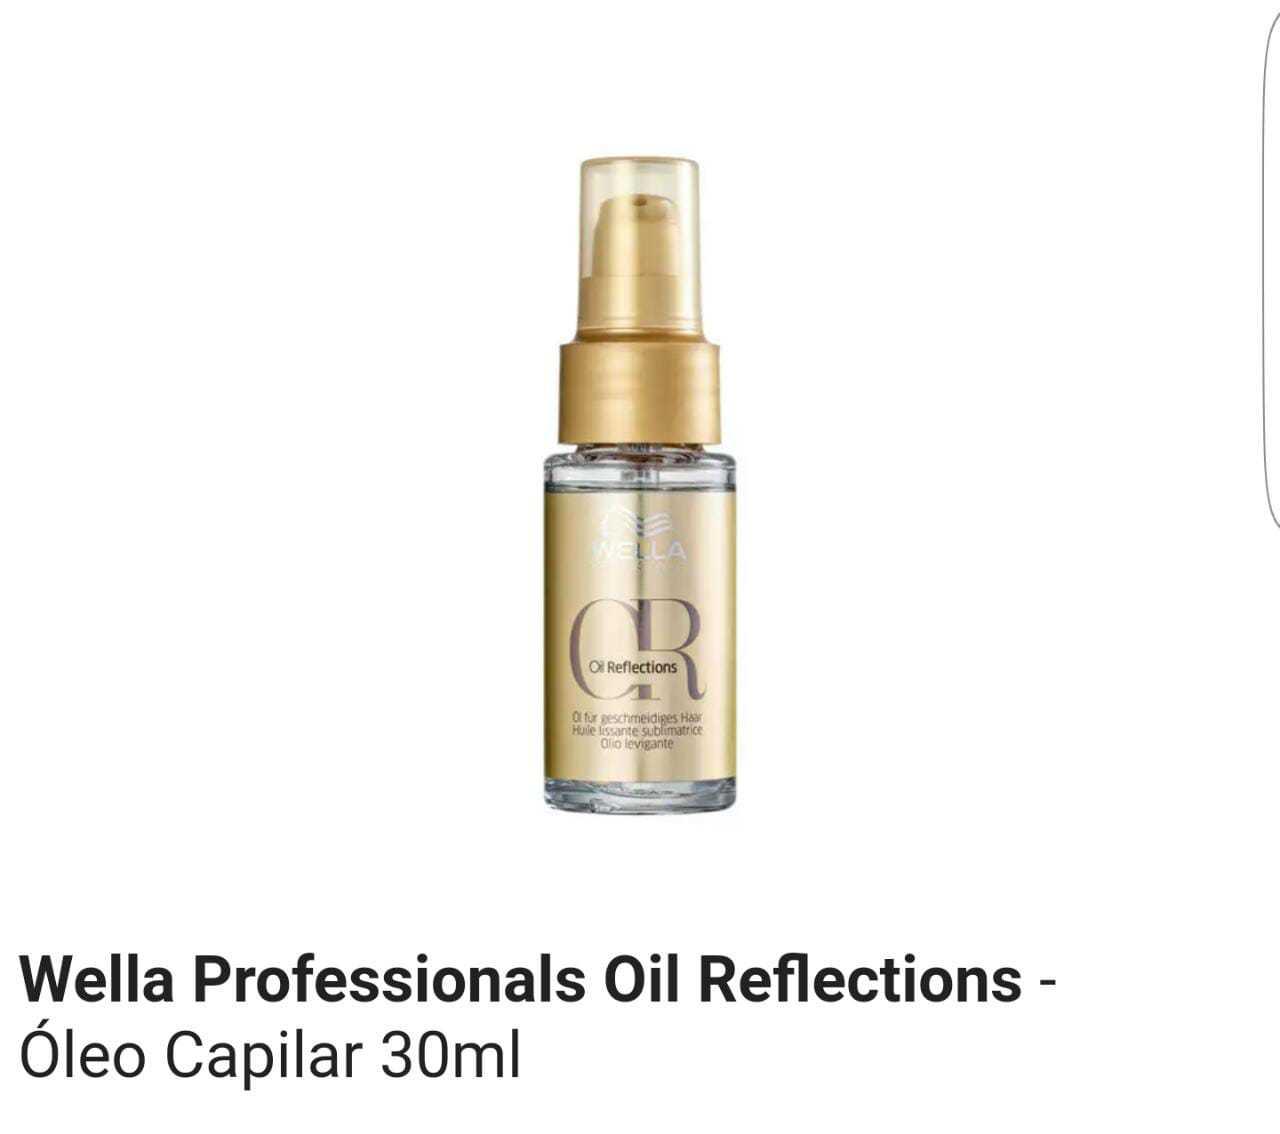 Óleo Capilar Wella Oil Reflections 30 ml MS Cosmético